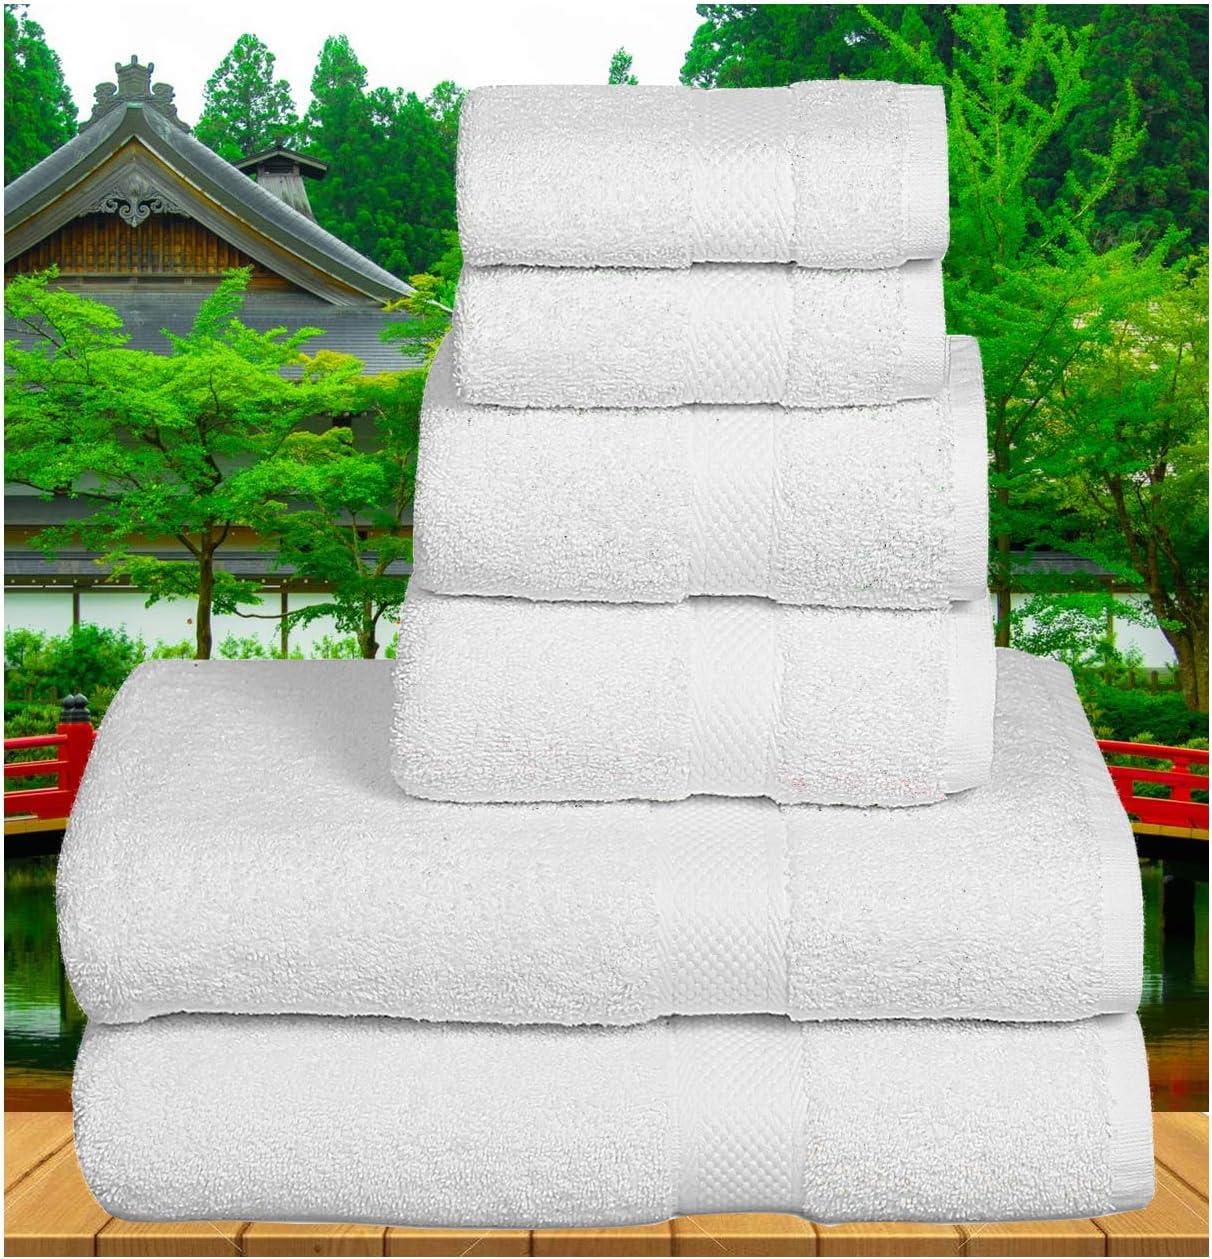 Premium Cotton 6 Piece Towel Set - Hand Bath Dealing full price reduction Max 71% OFF 2 Towels